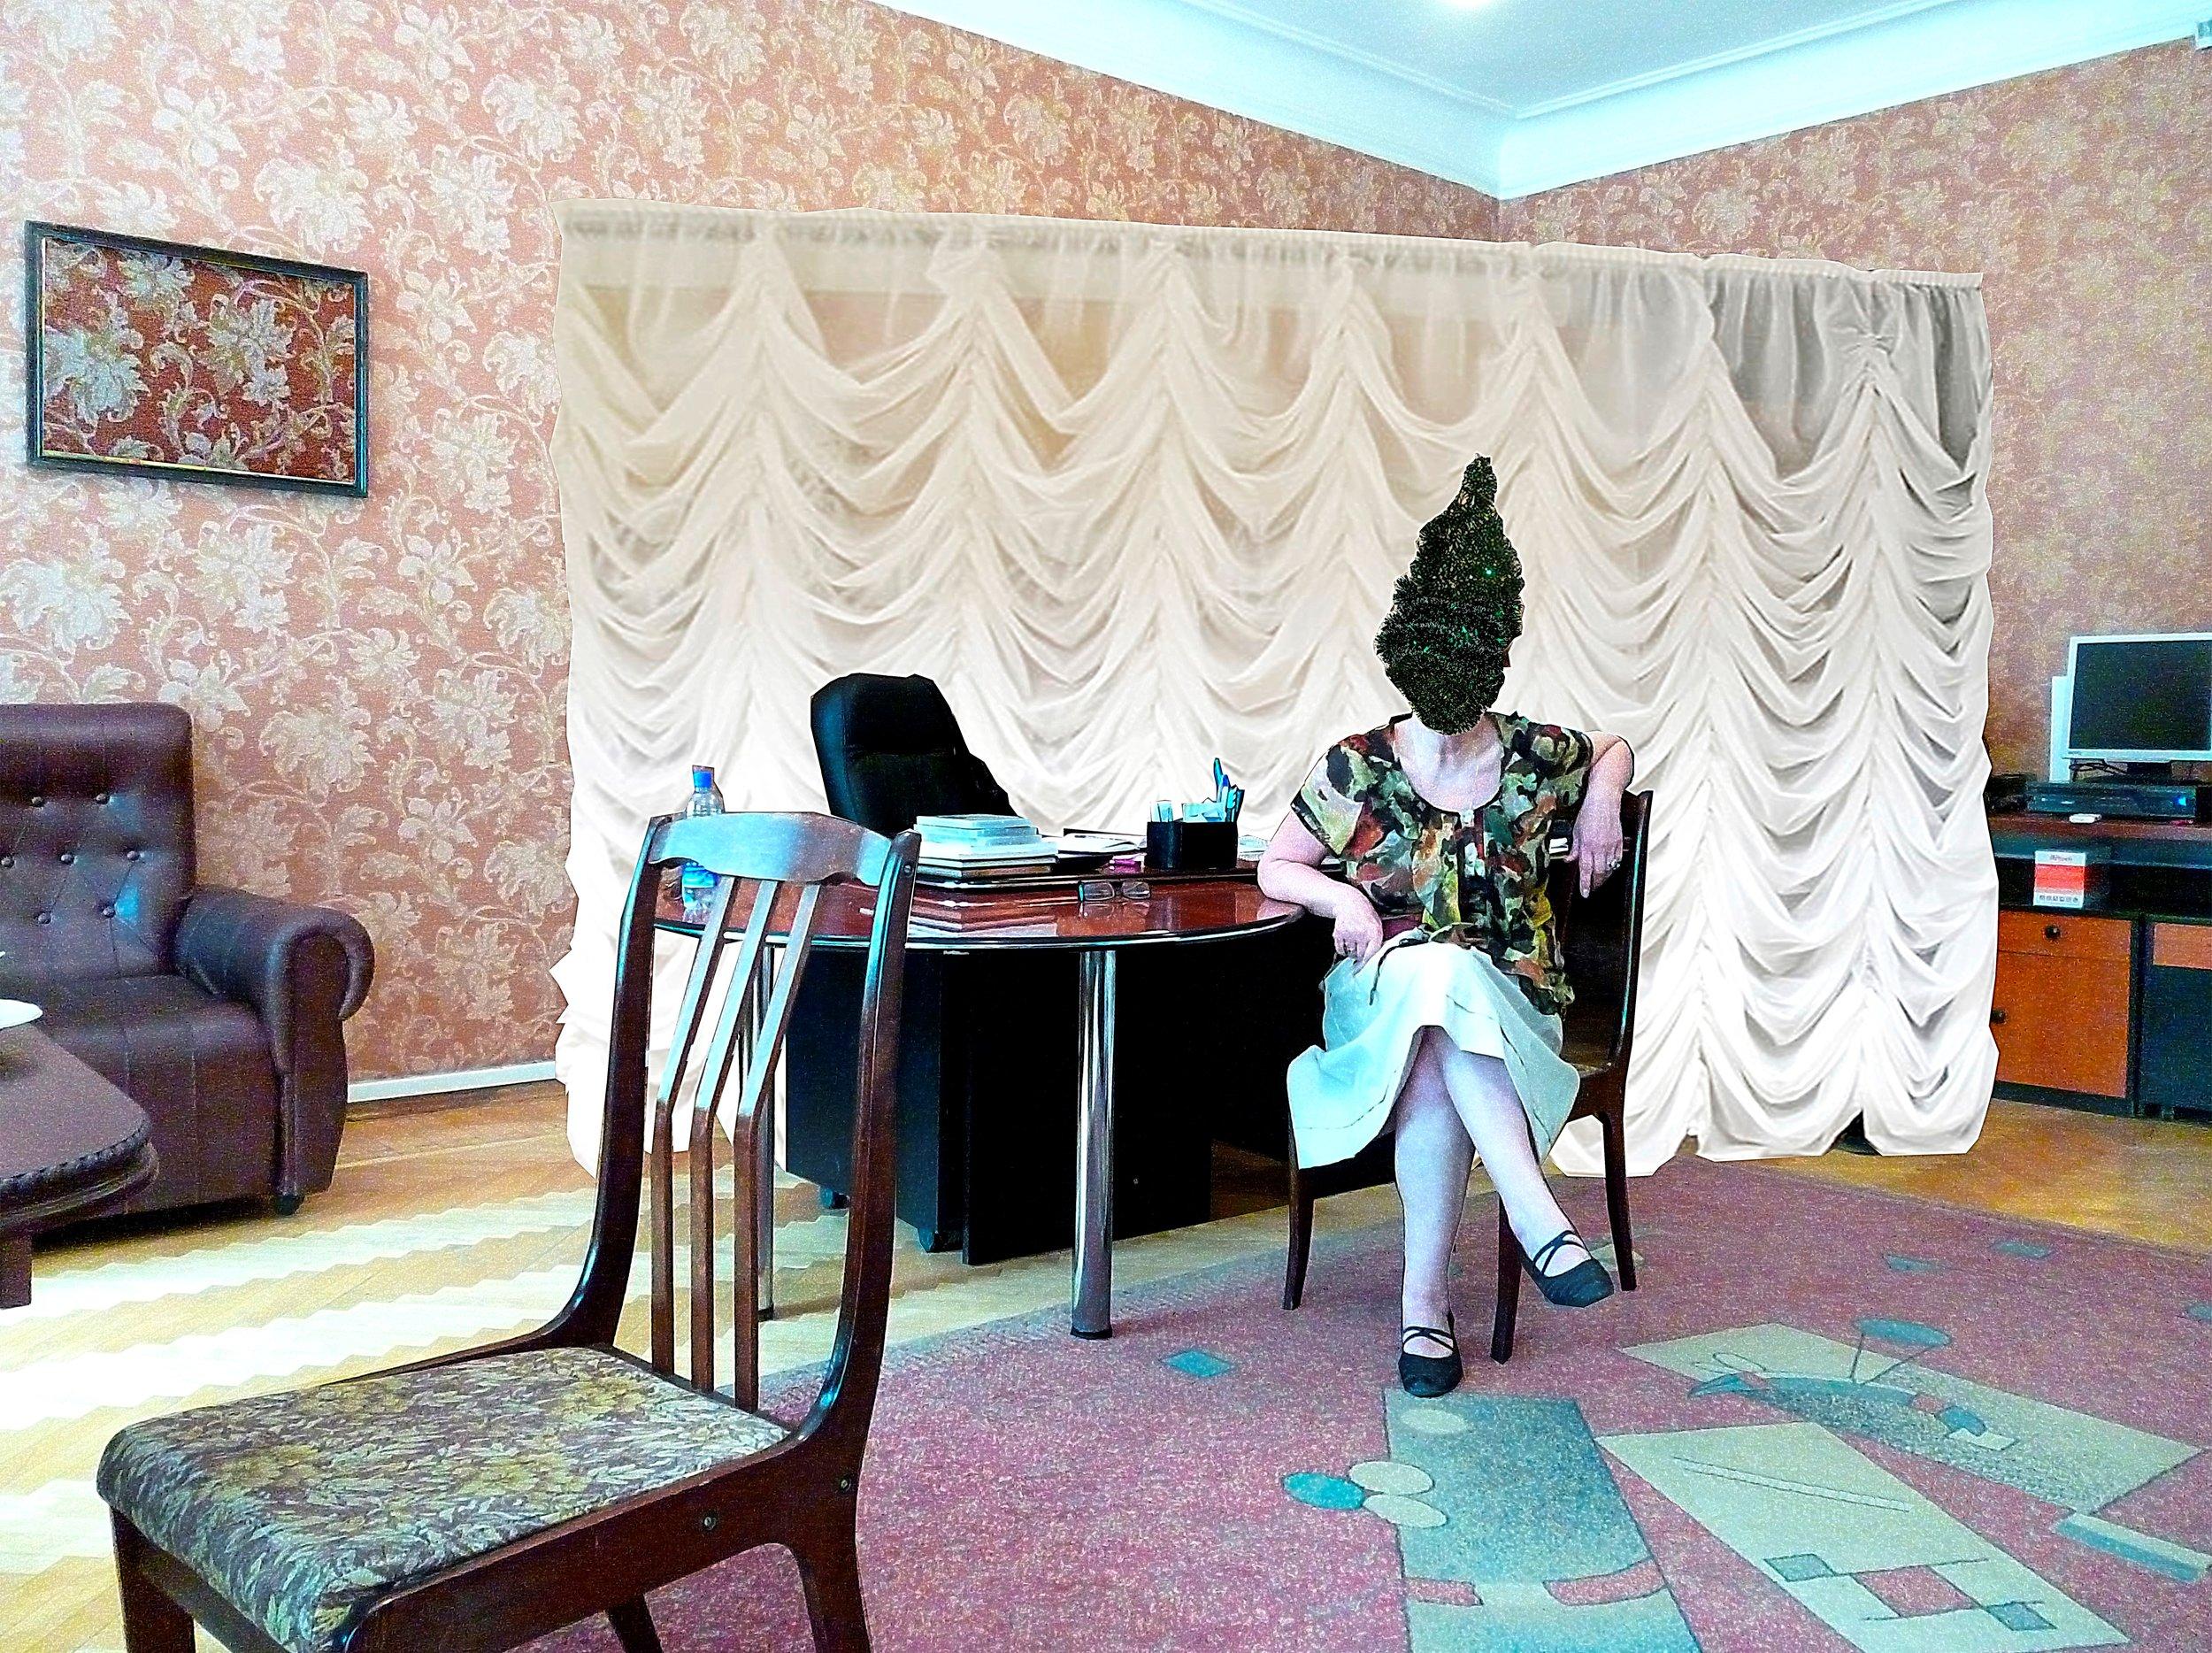 Bakhit Bubikanova,  New Year's Postcard , 2015. Courtesy the artist and Focus Kazakhstan